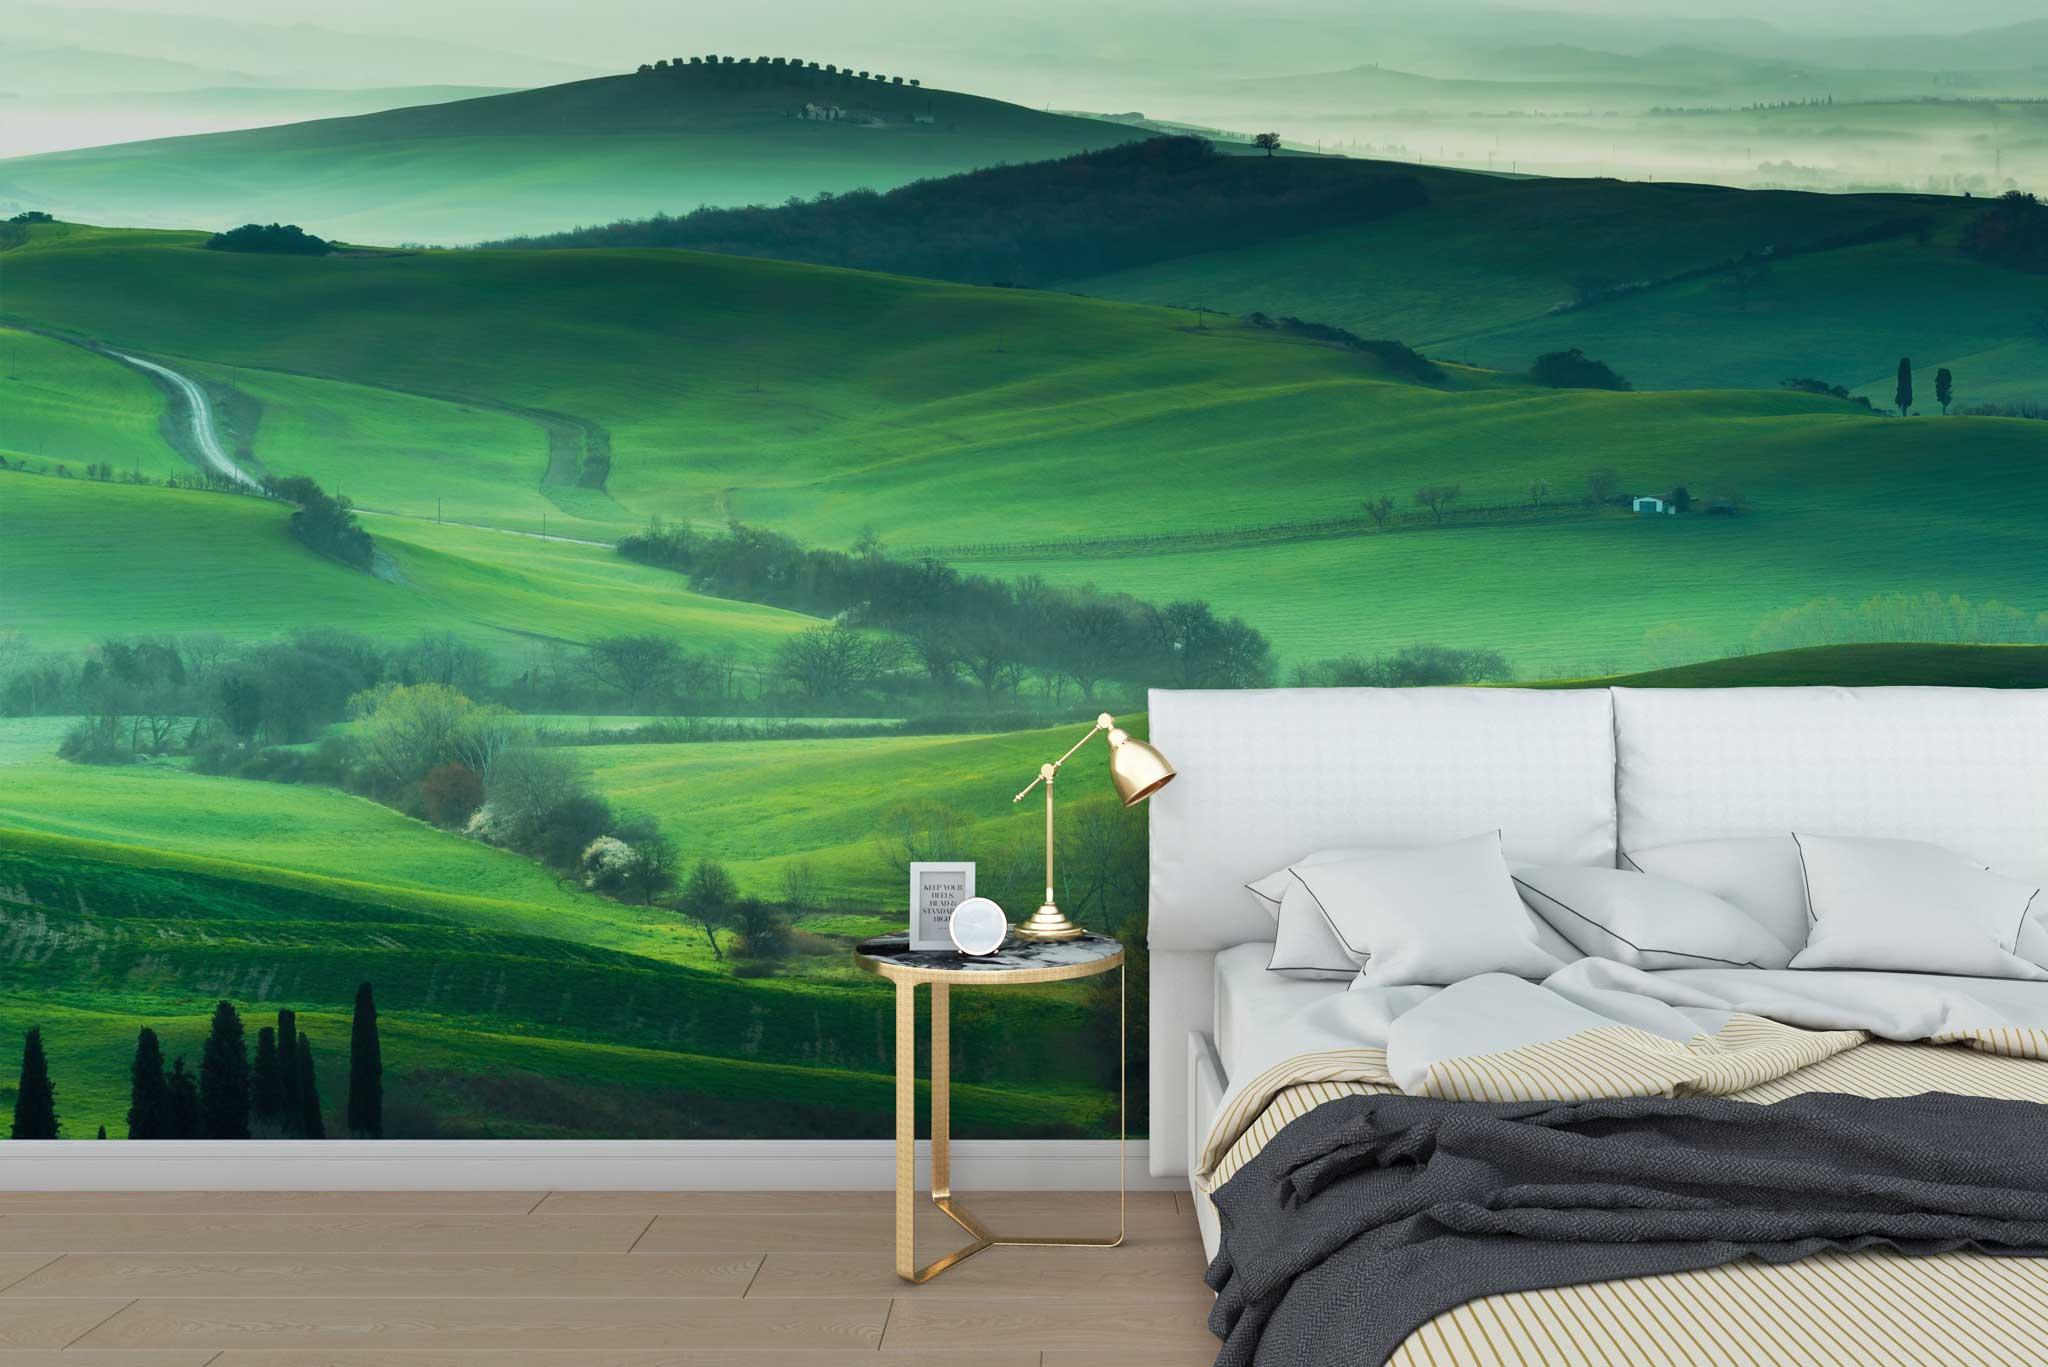 tapet-fototapet-special-personalizat-customizabil-comanda-bucuresti-daring-prints-model-fotografie-peisaj-dealuri-verzi-campie-iarba-verde-senin-calm